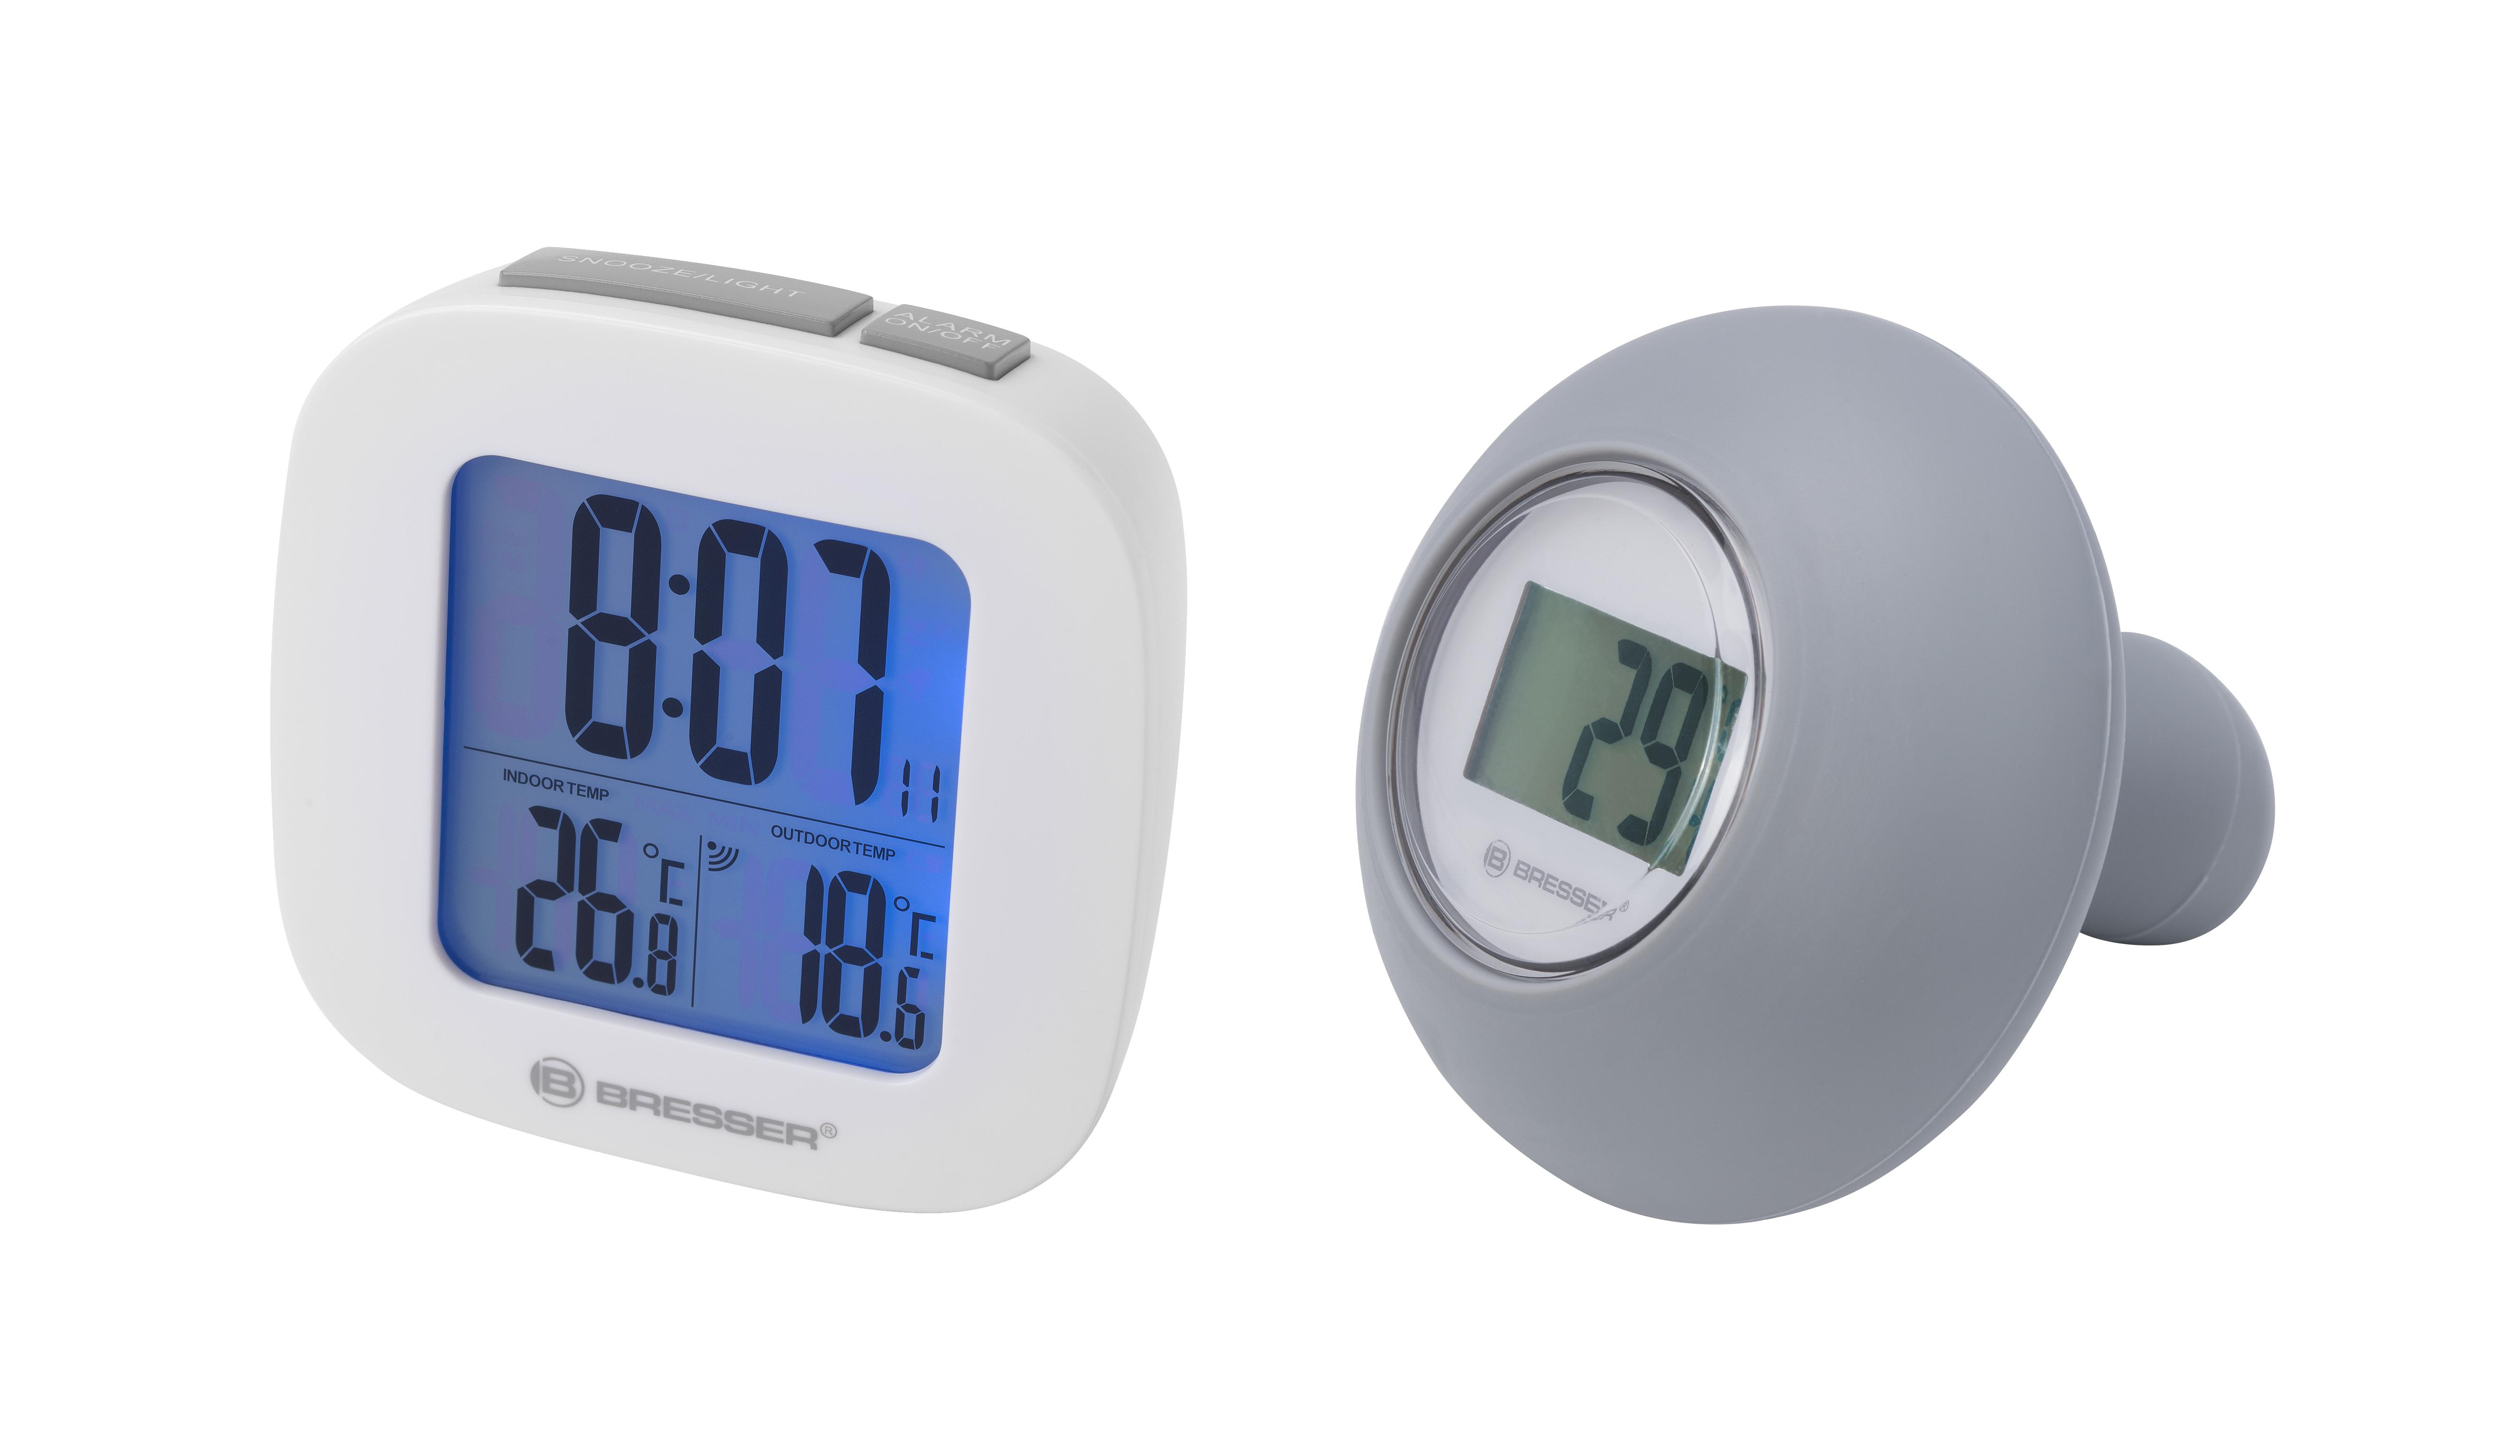 BRESSER MyTemp WTM digitales Badthermometer